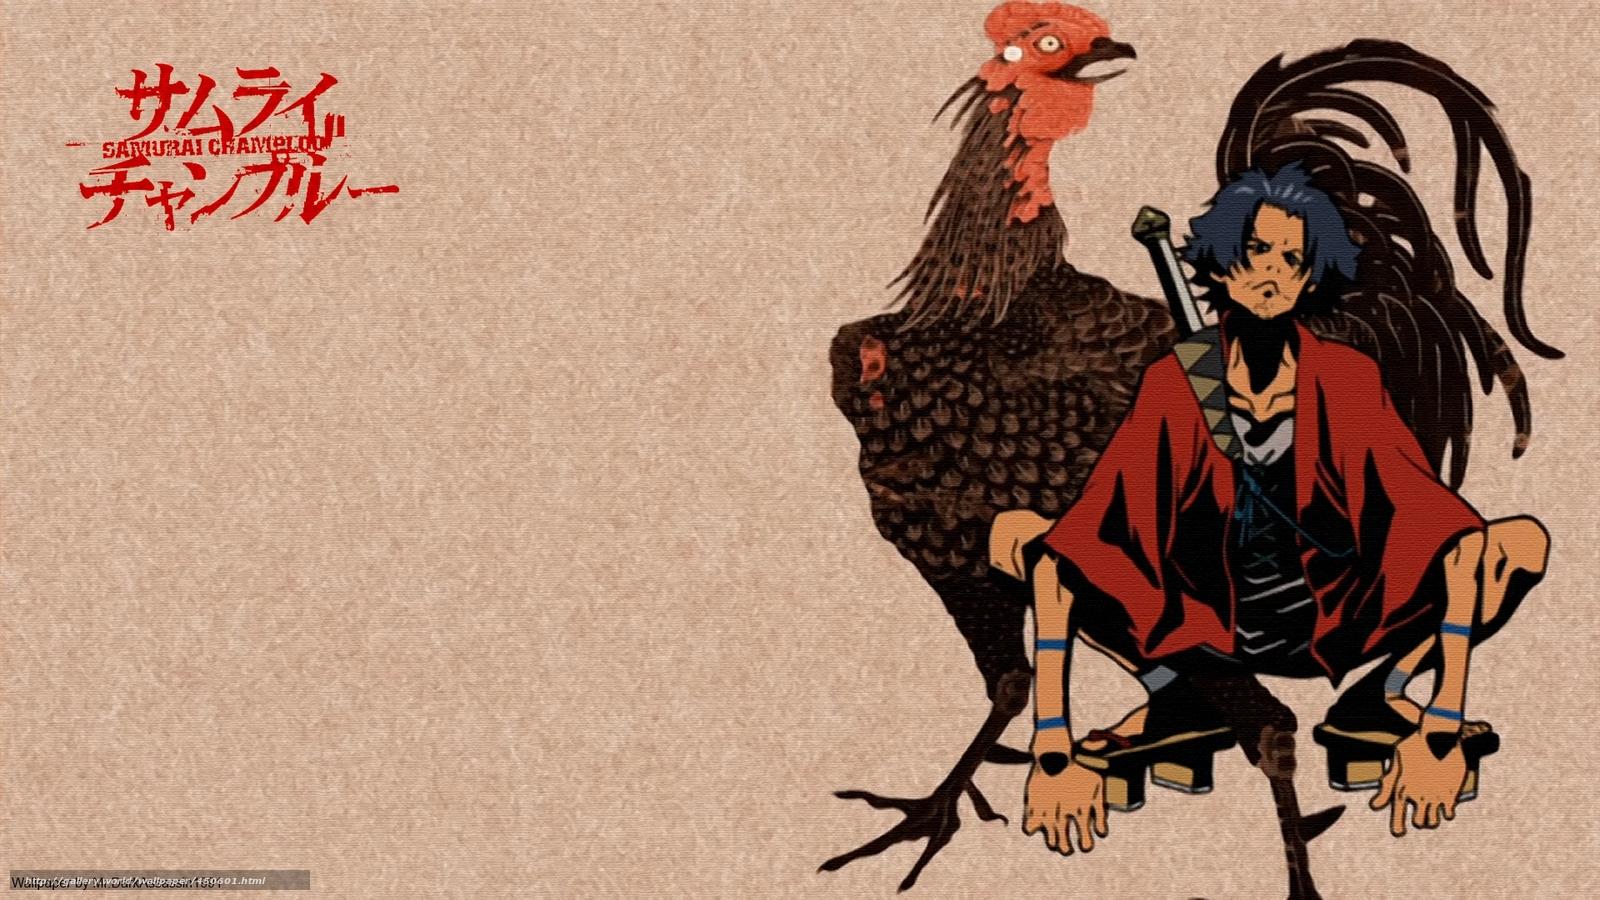 Download wallpaper samurai champloo Wandering Swordsman Mugen 1600x900